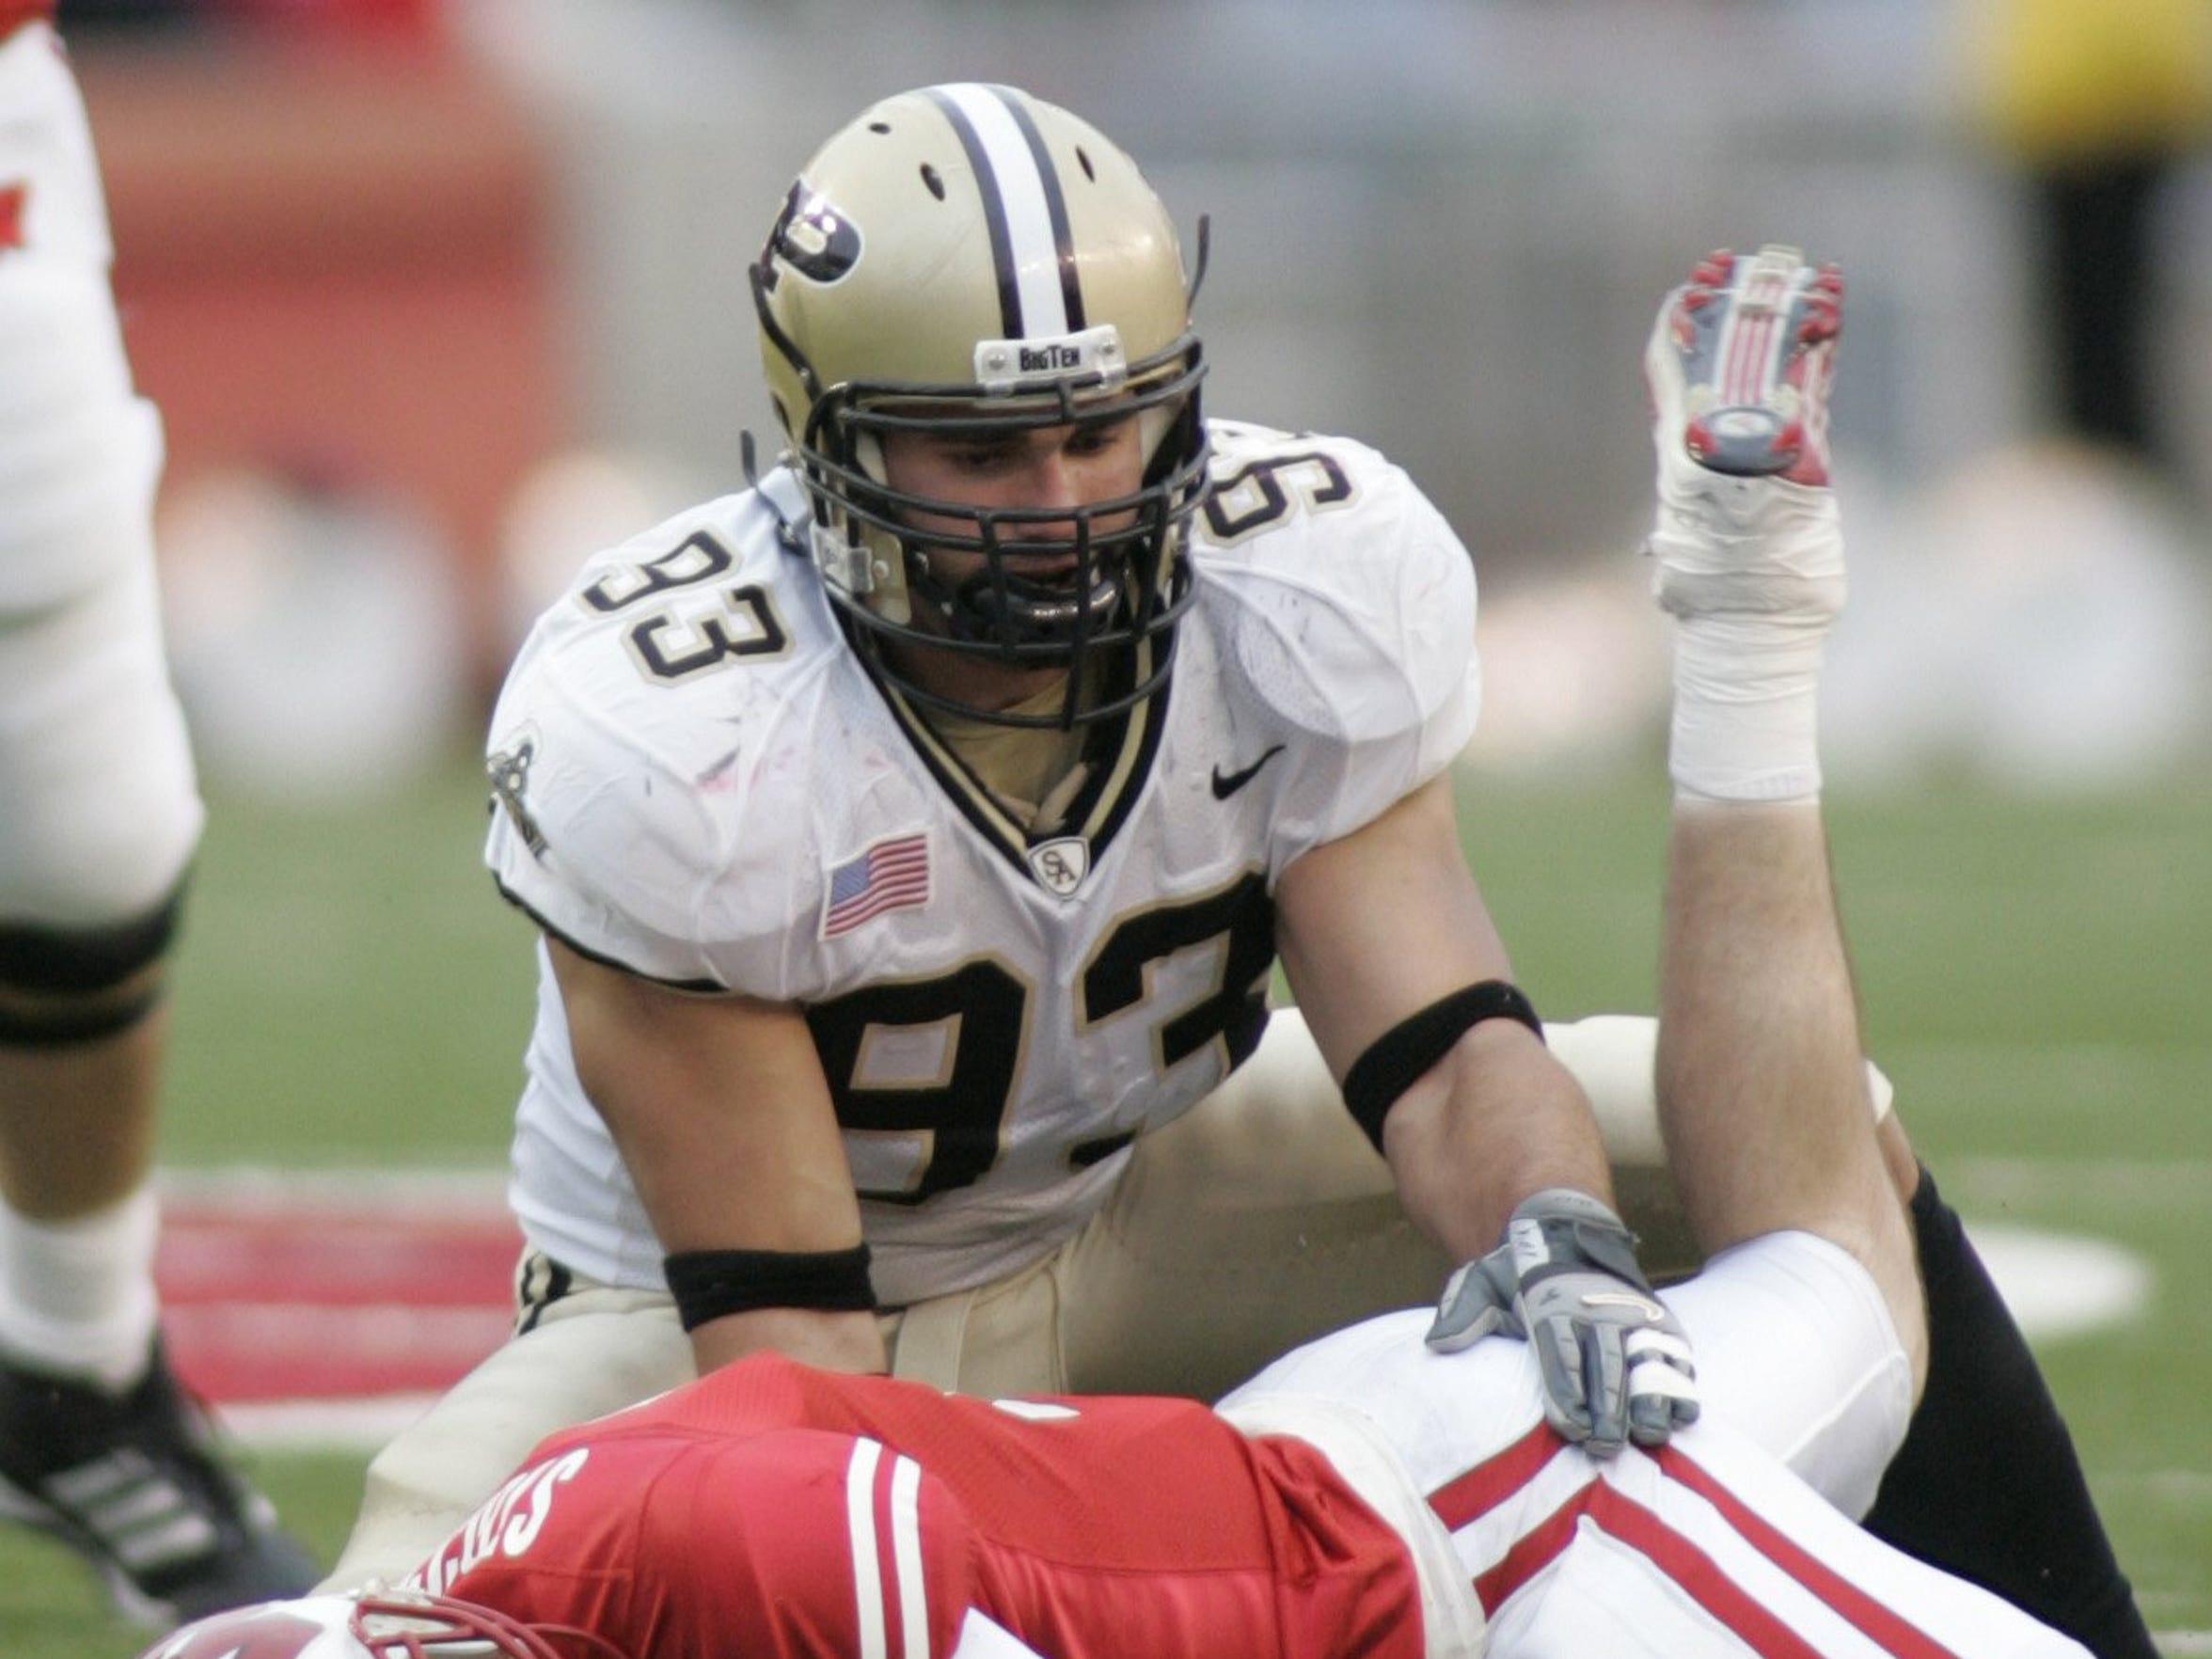 Purdue's Rob Ninkovich sacks Wisconsin's John Stocco